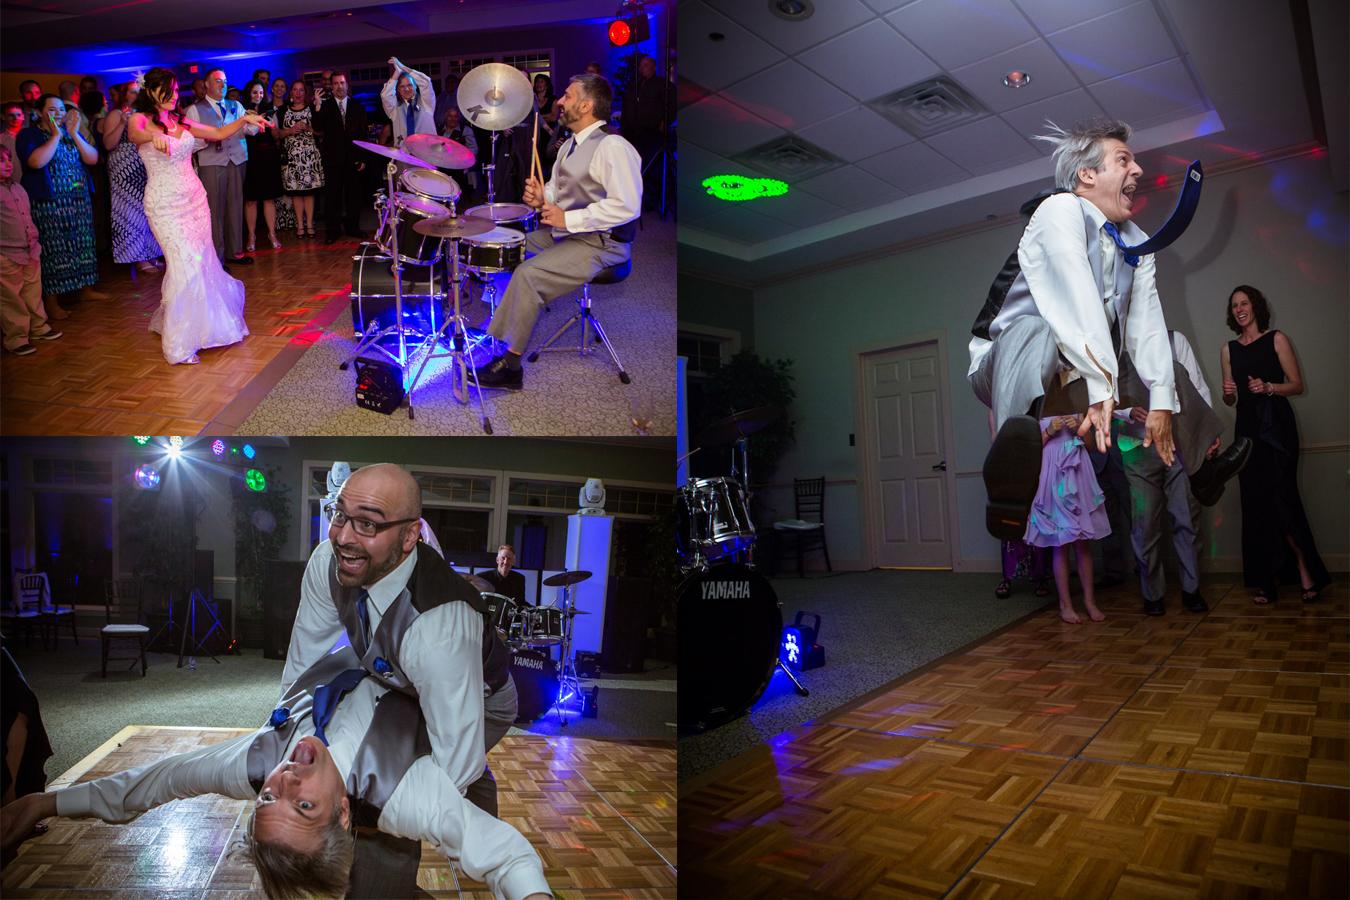 NEPA_Pocono_Weddings_Rob_Lettieri_Photography_18.jpg